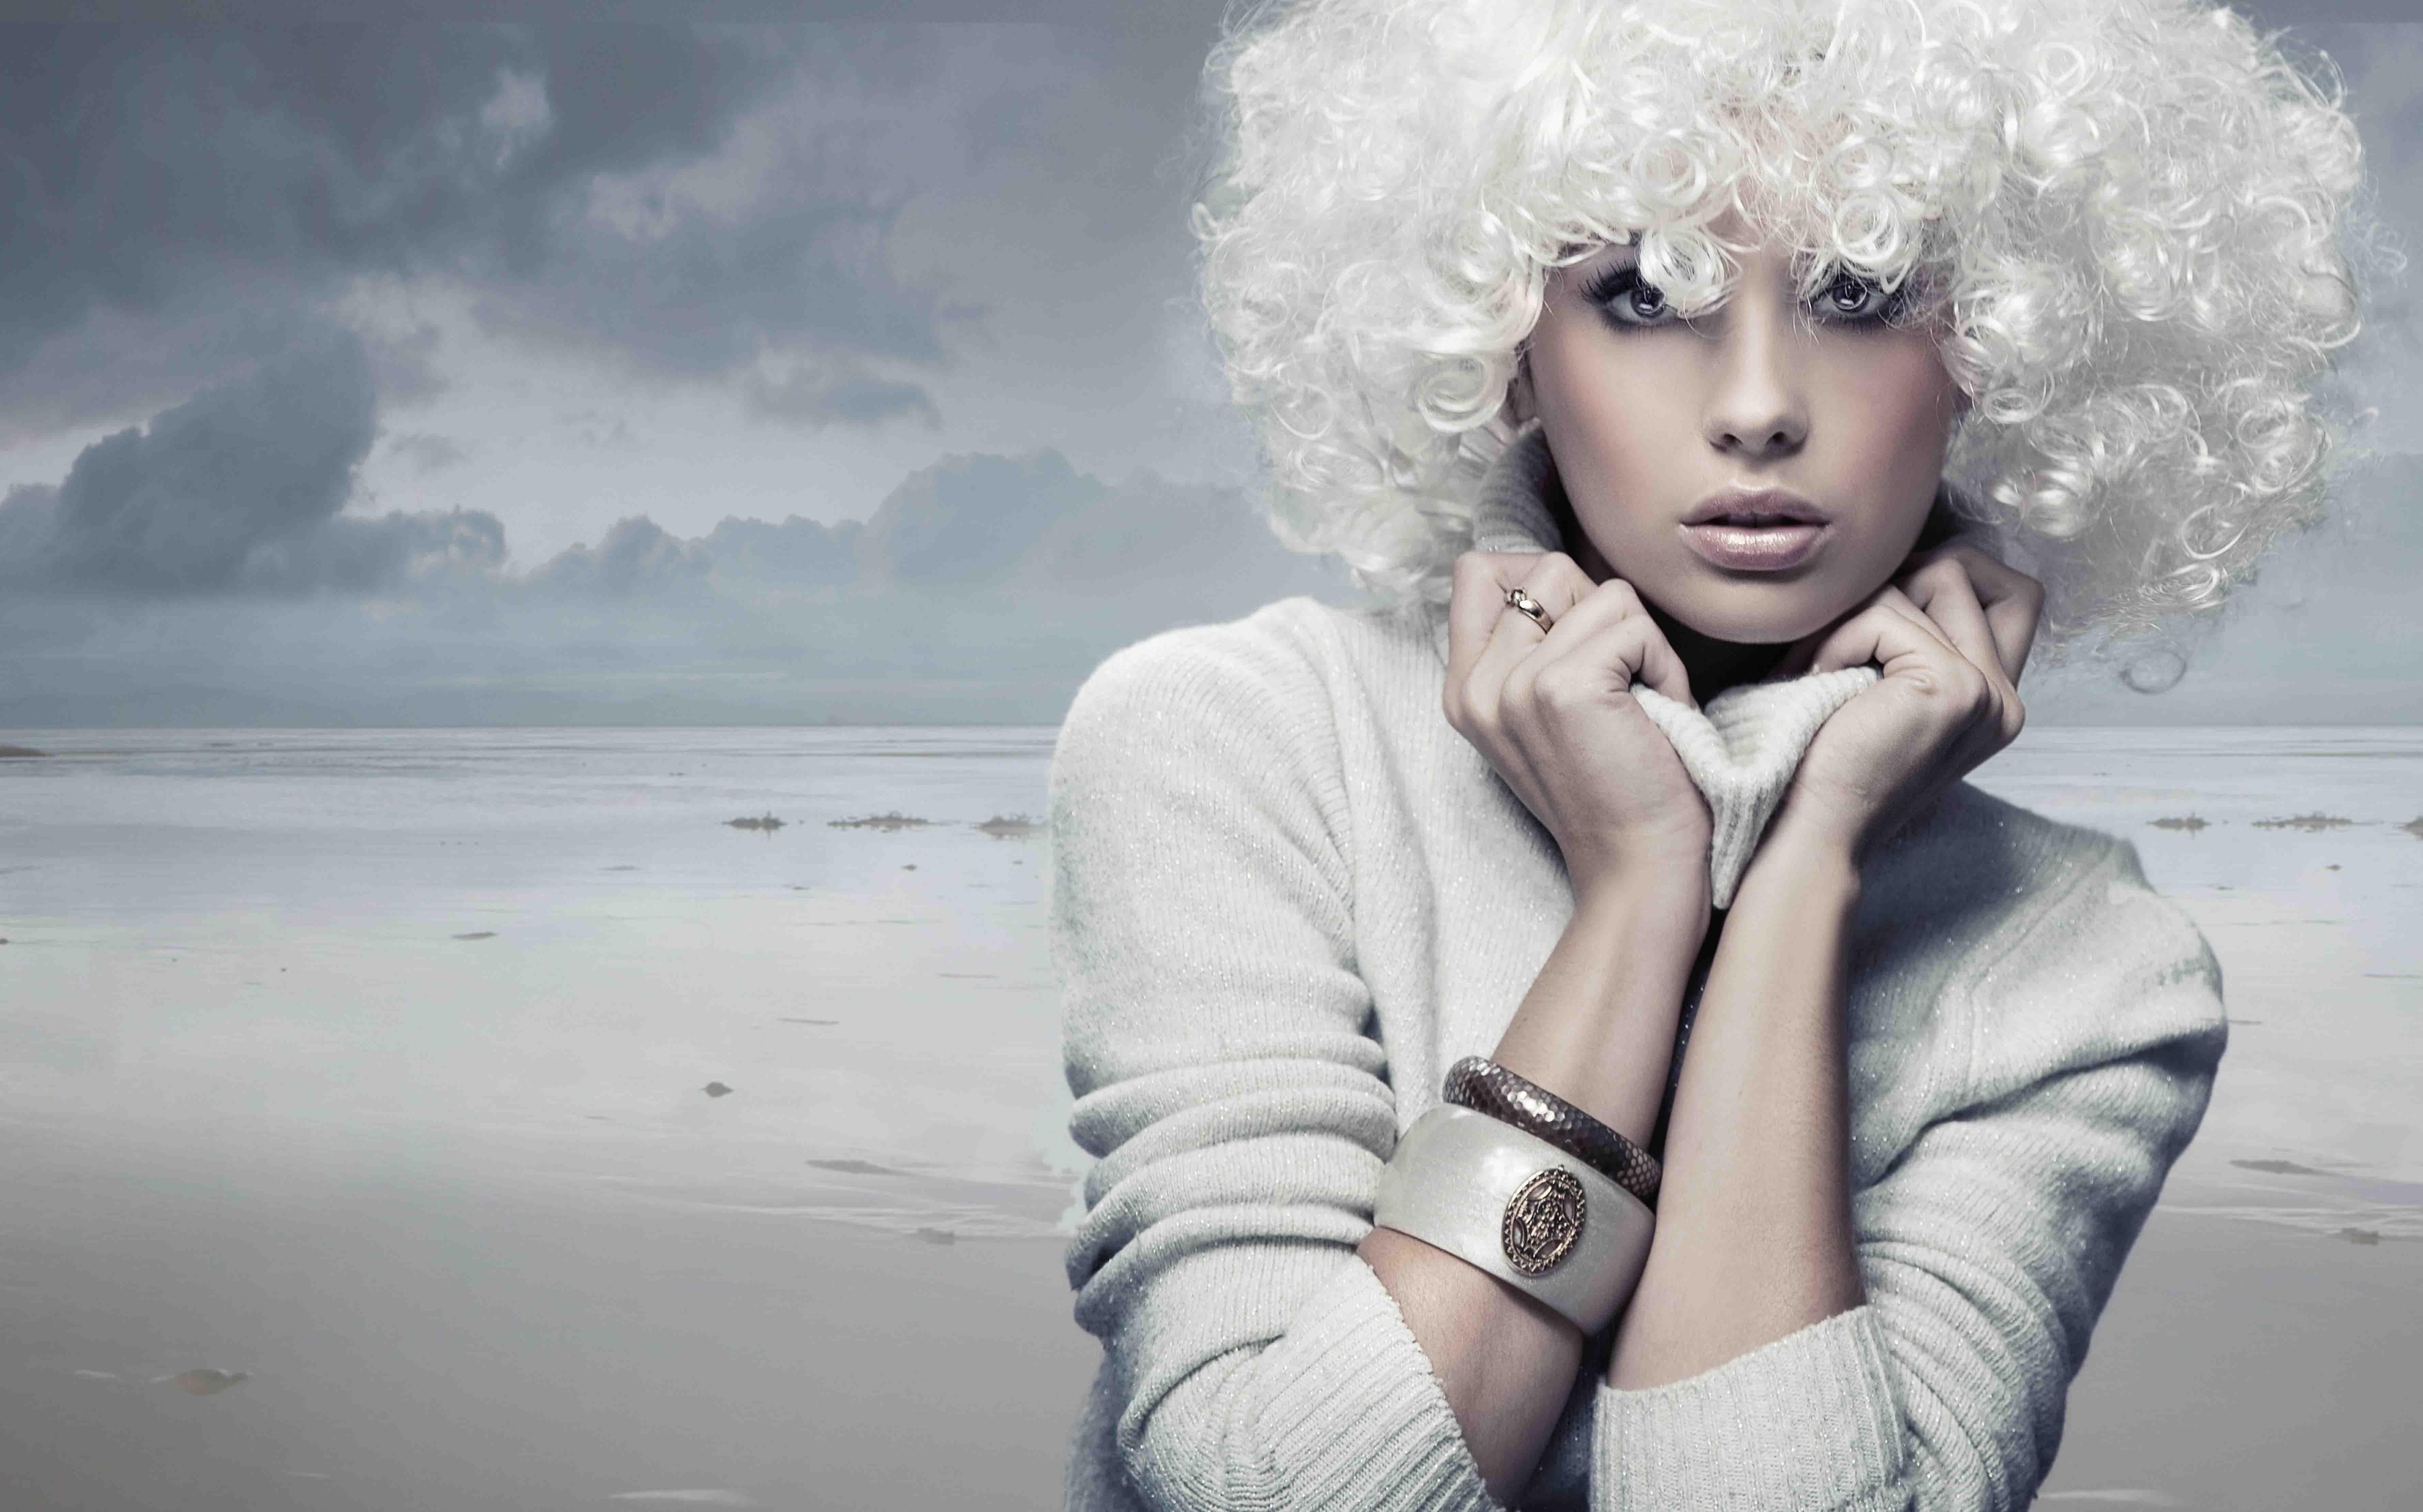 capelli-autunno-zephir-parrucchieri-ascona-muralto.jpg